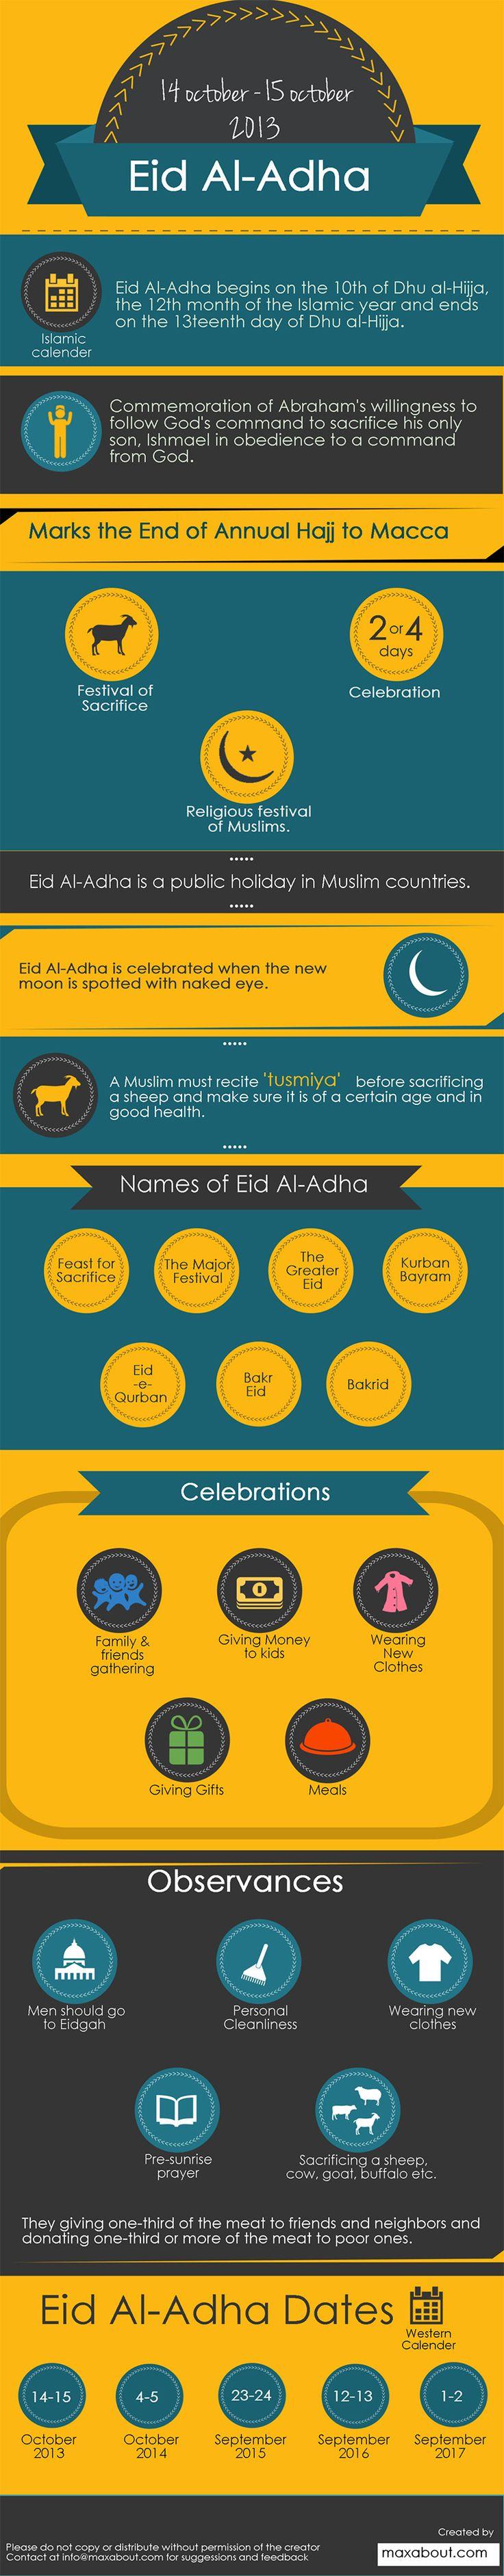 Eid Al-Adha #Infographic #Eid